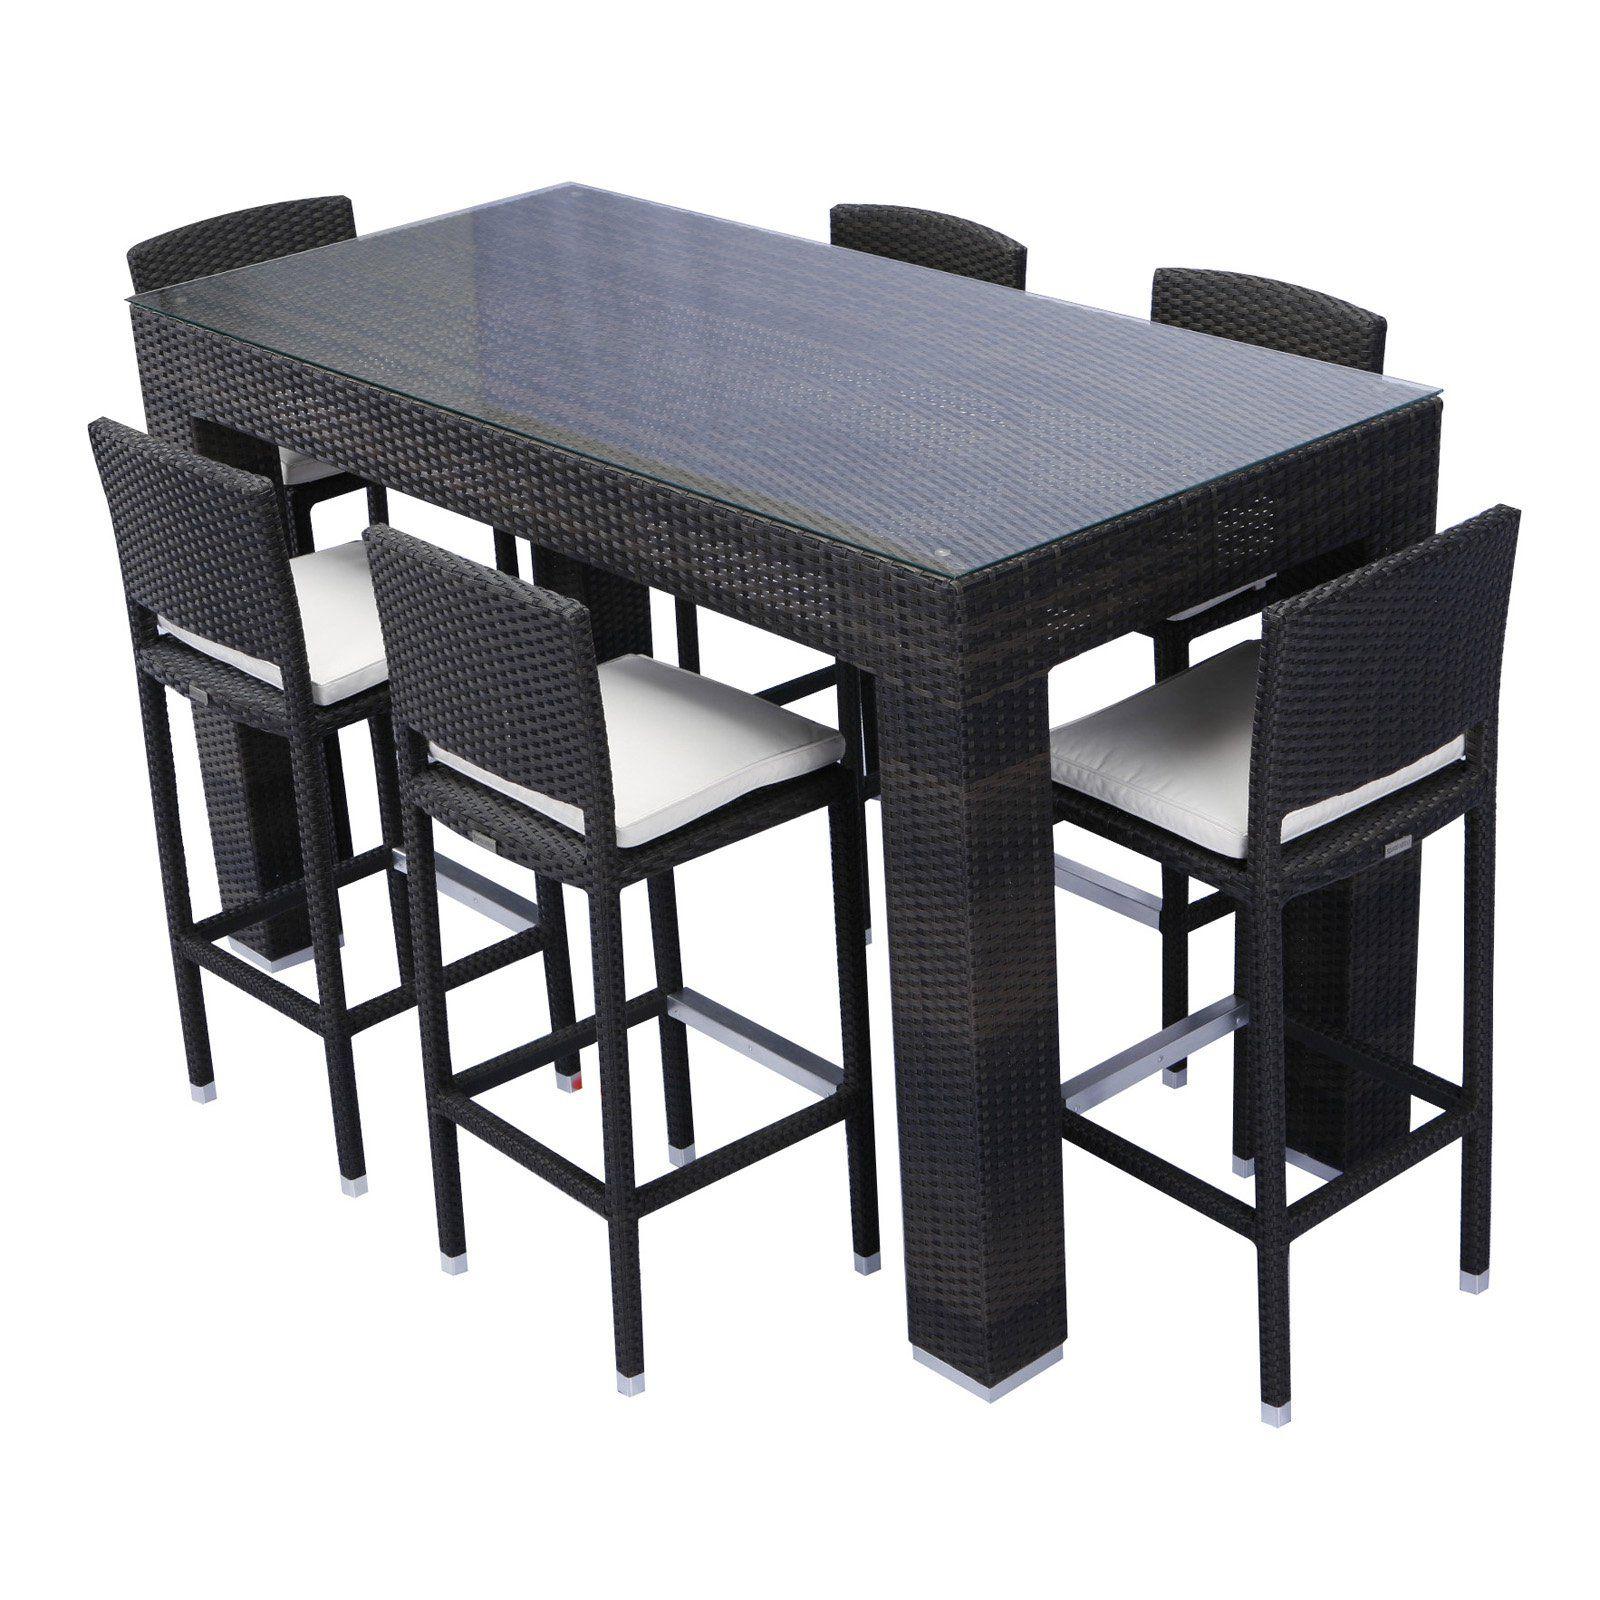 Source Outdoor Bar Height Patio Dining Set Seats 6 Hd 08166